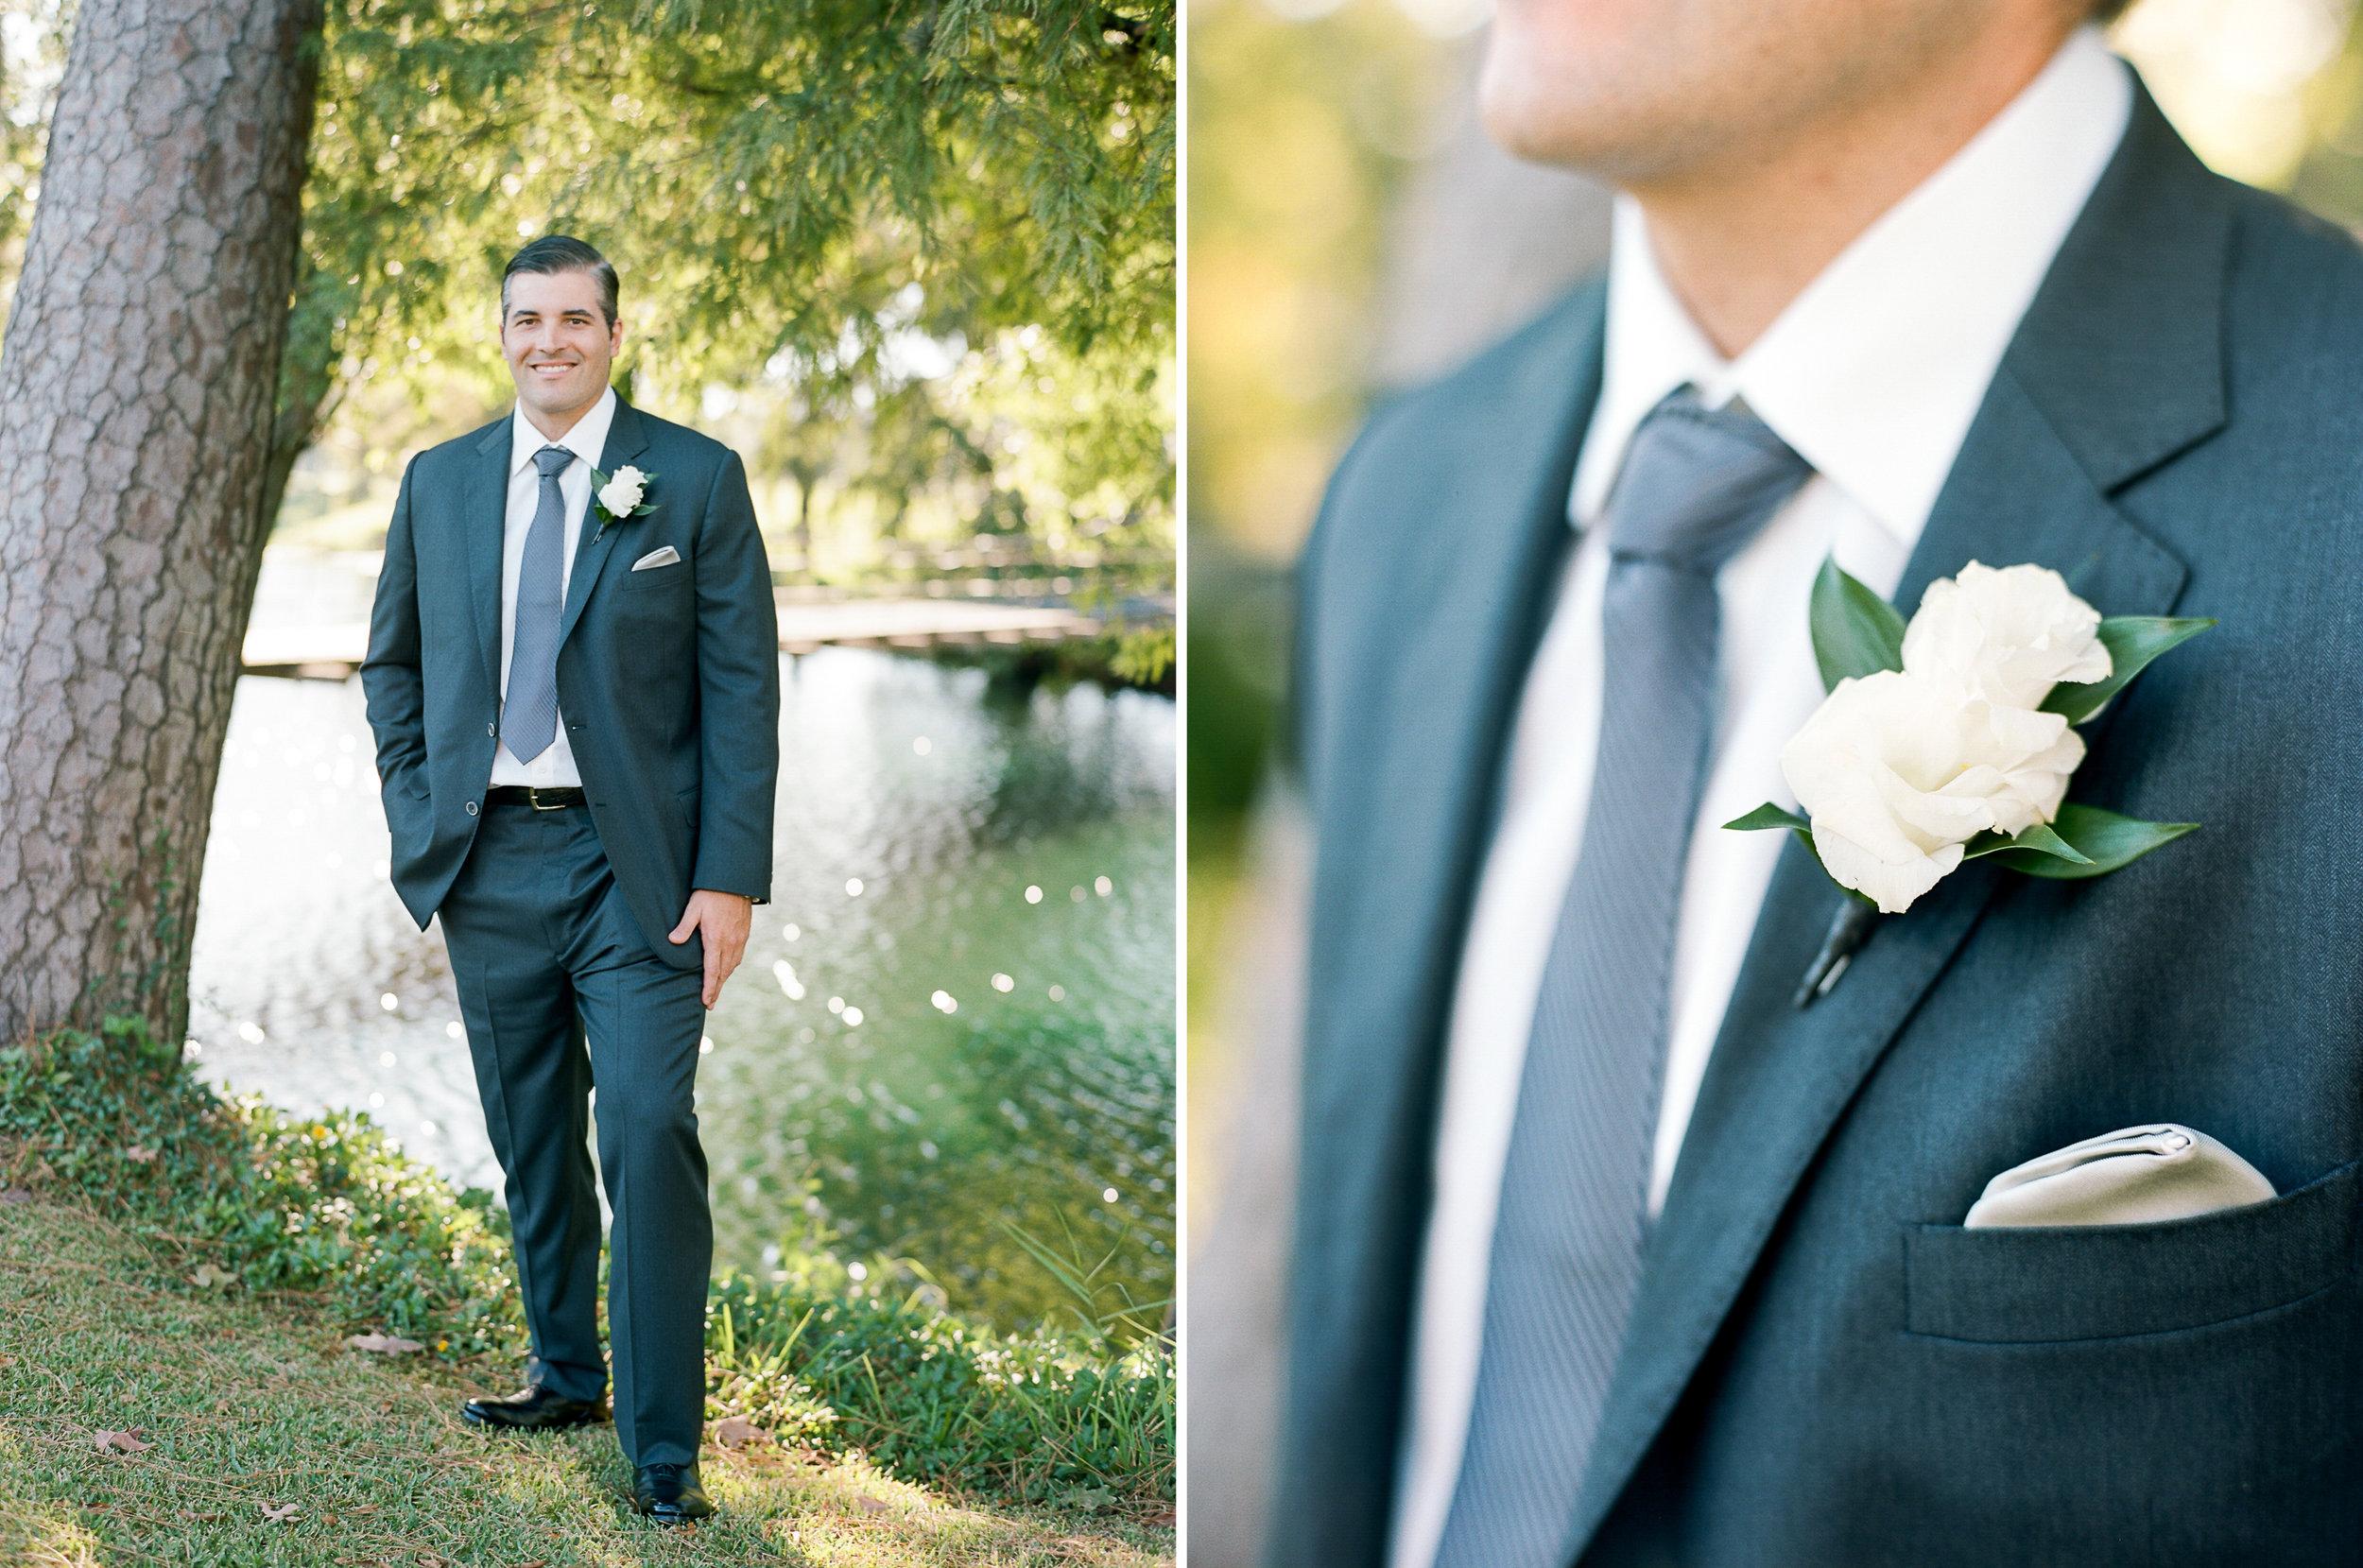 Houston-Wedding-Photographer-Lakeside-Country-Club-First-Look-Bride-Groom-Formals-Film-Fine-Art-Photography-104.jpg